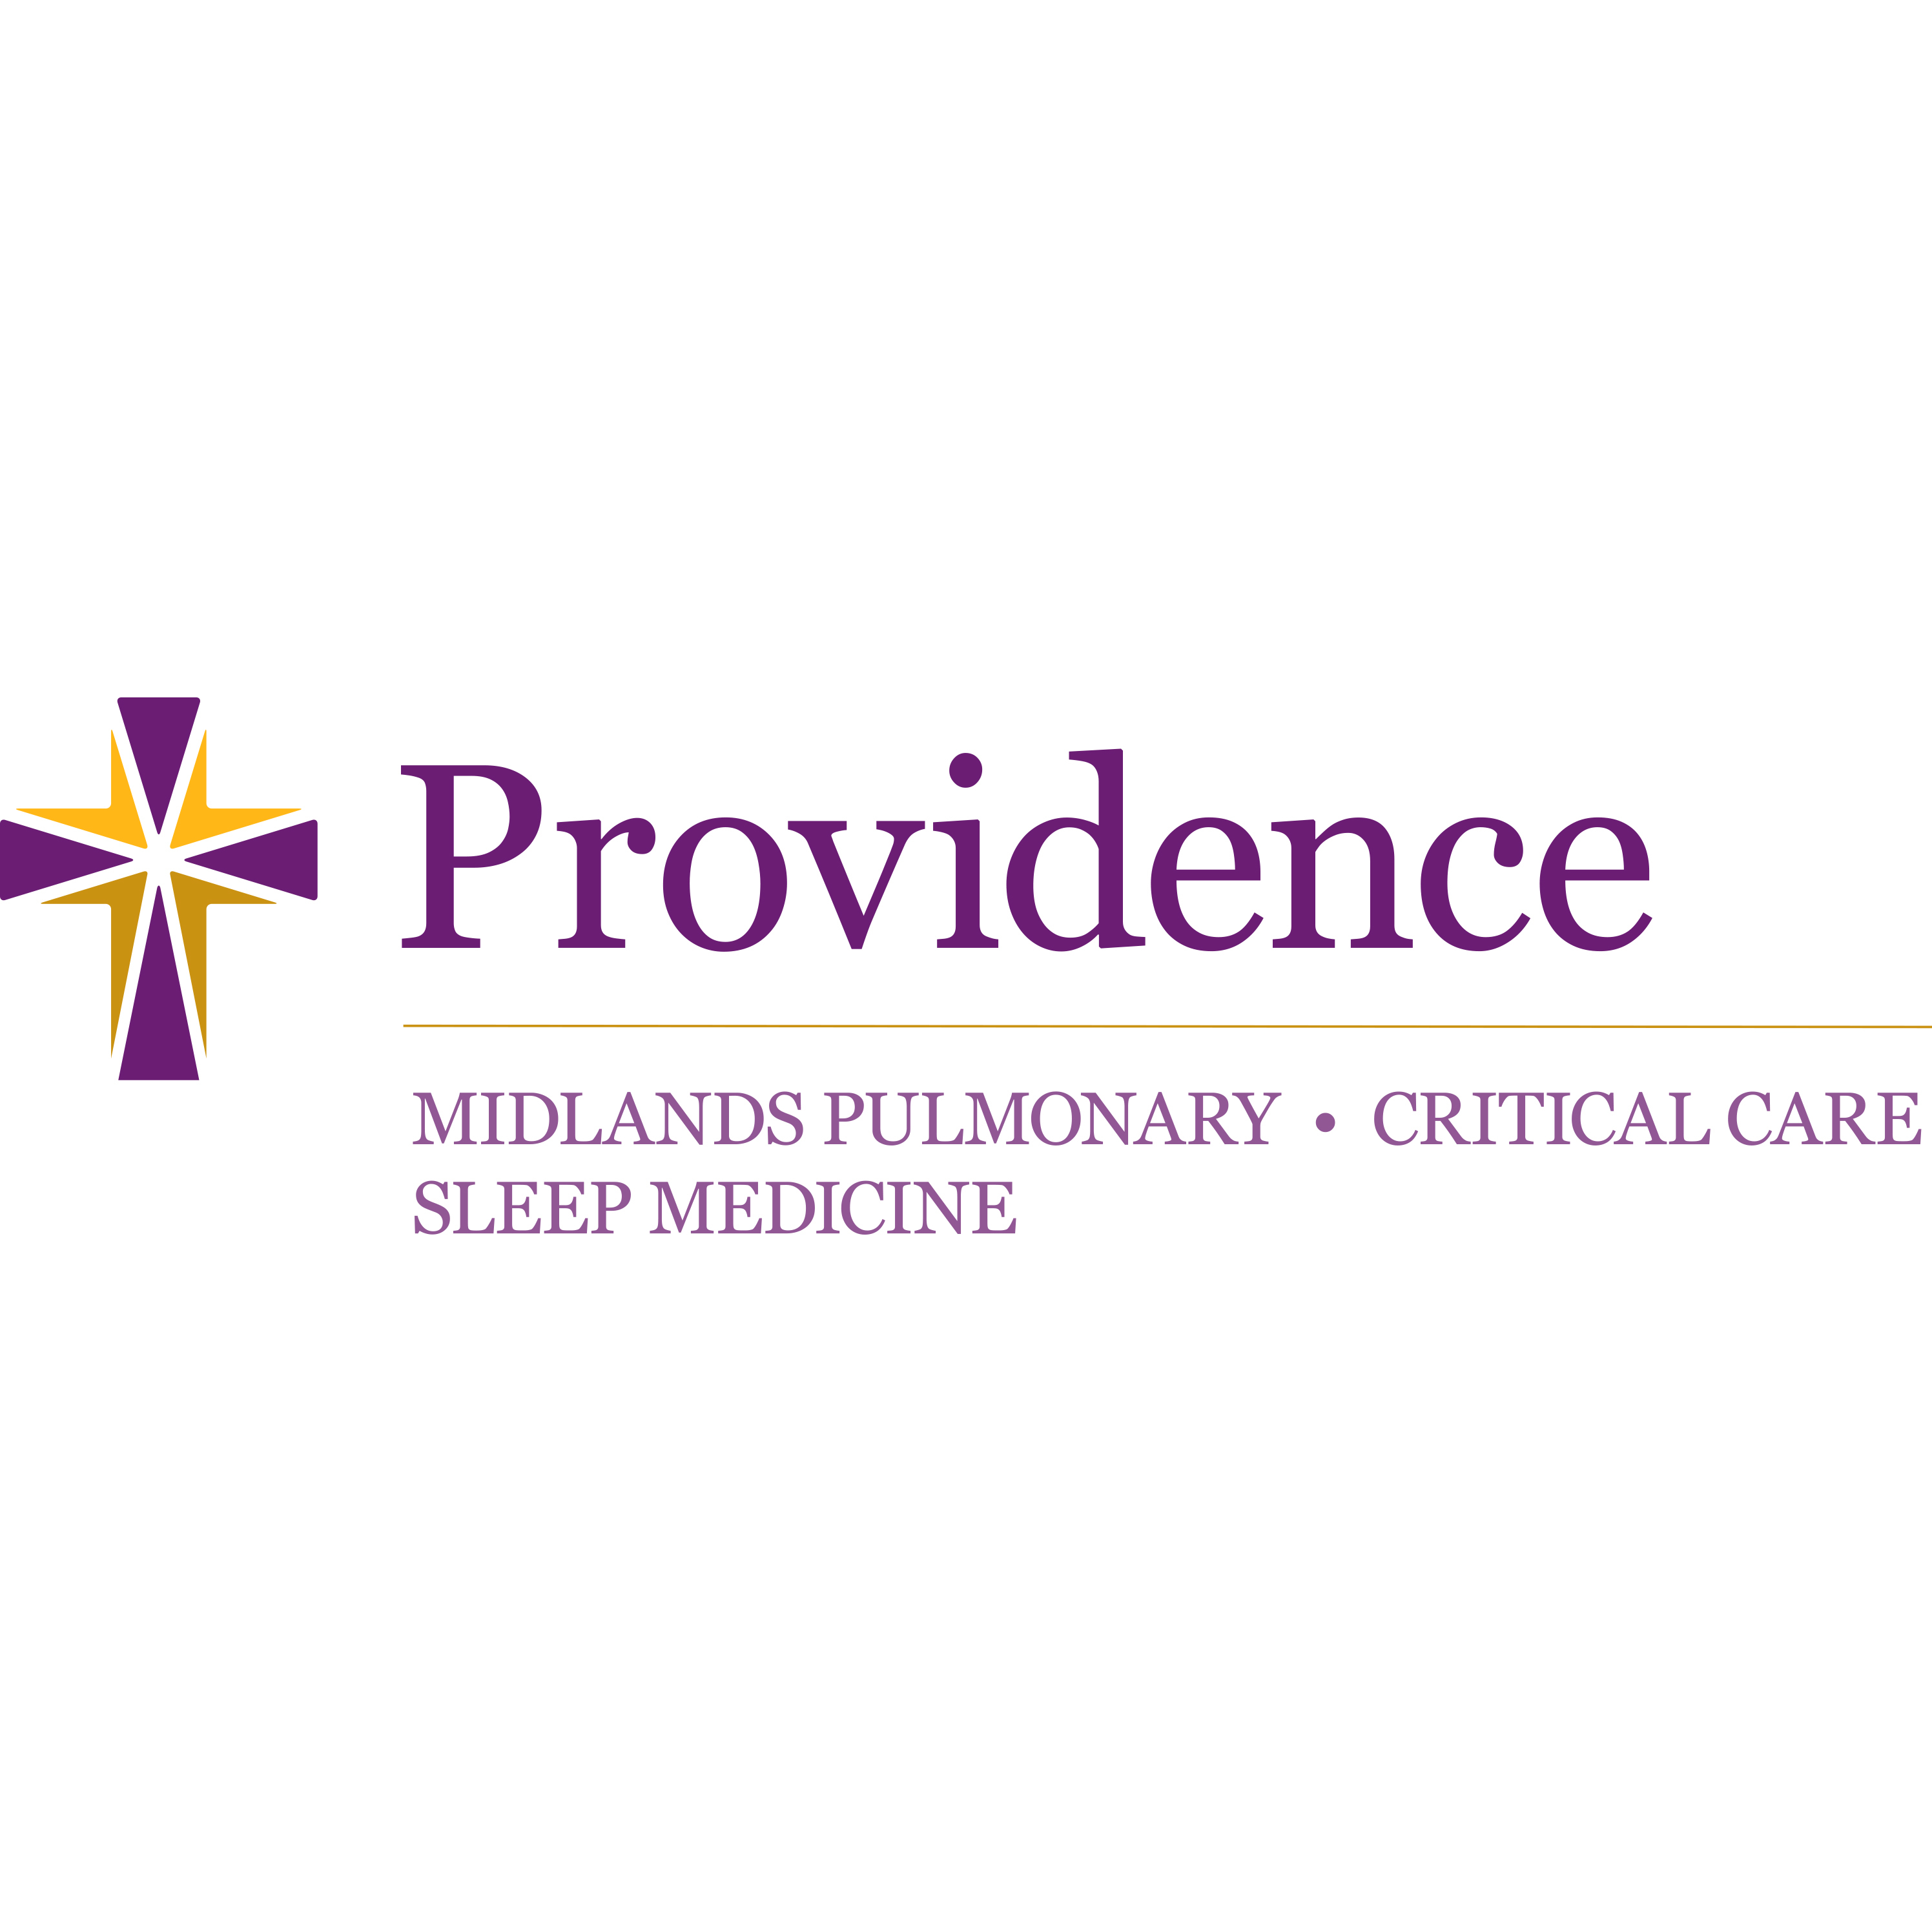 Providence Midlands Pulmonary, Critical Care, Sleep Medicine image 1